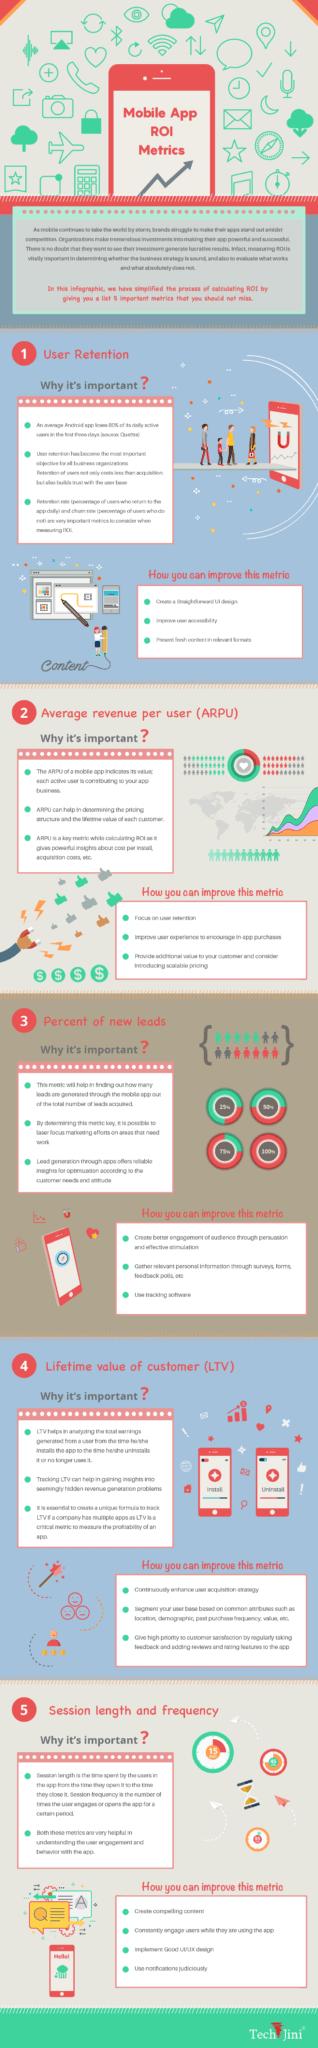 Infographic Mobile App ROI Mertics